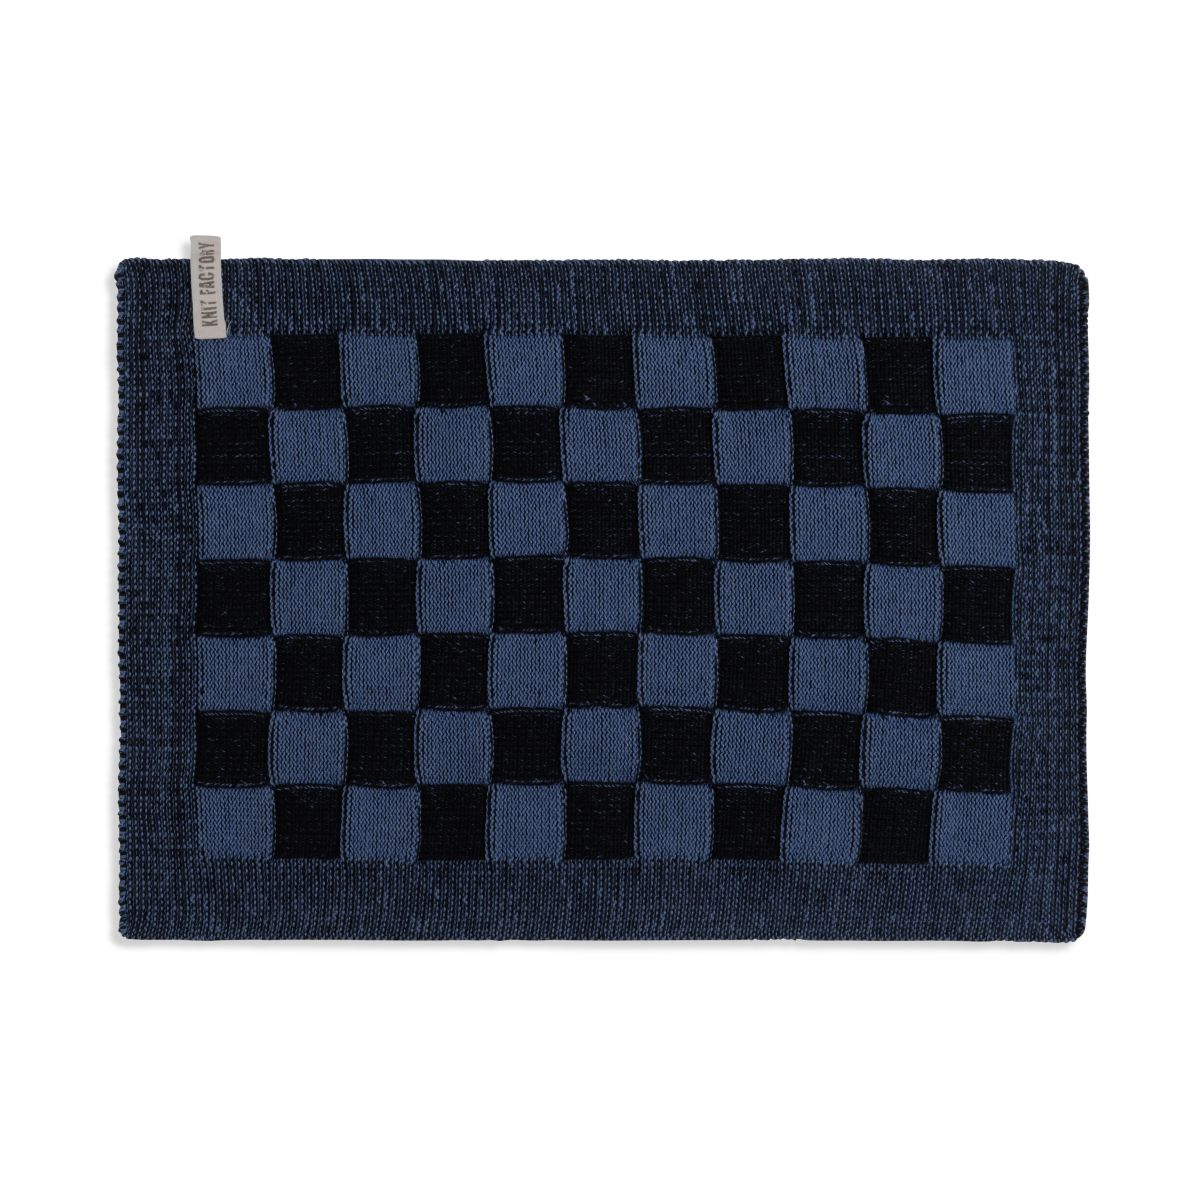 placemat block blackjeans